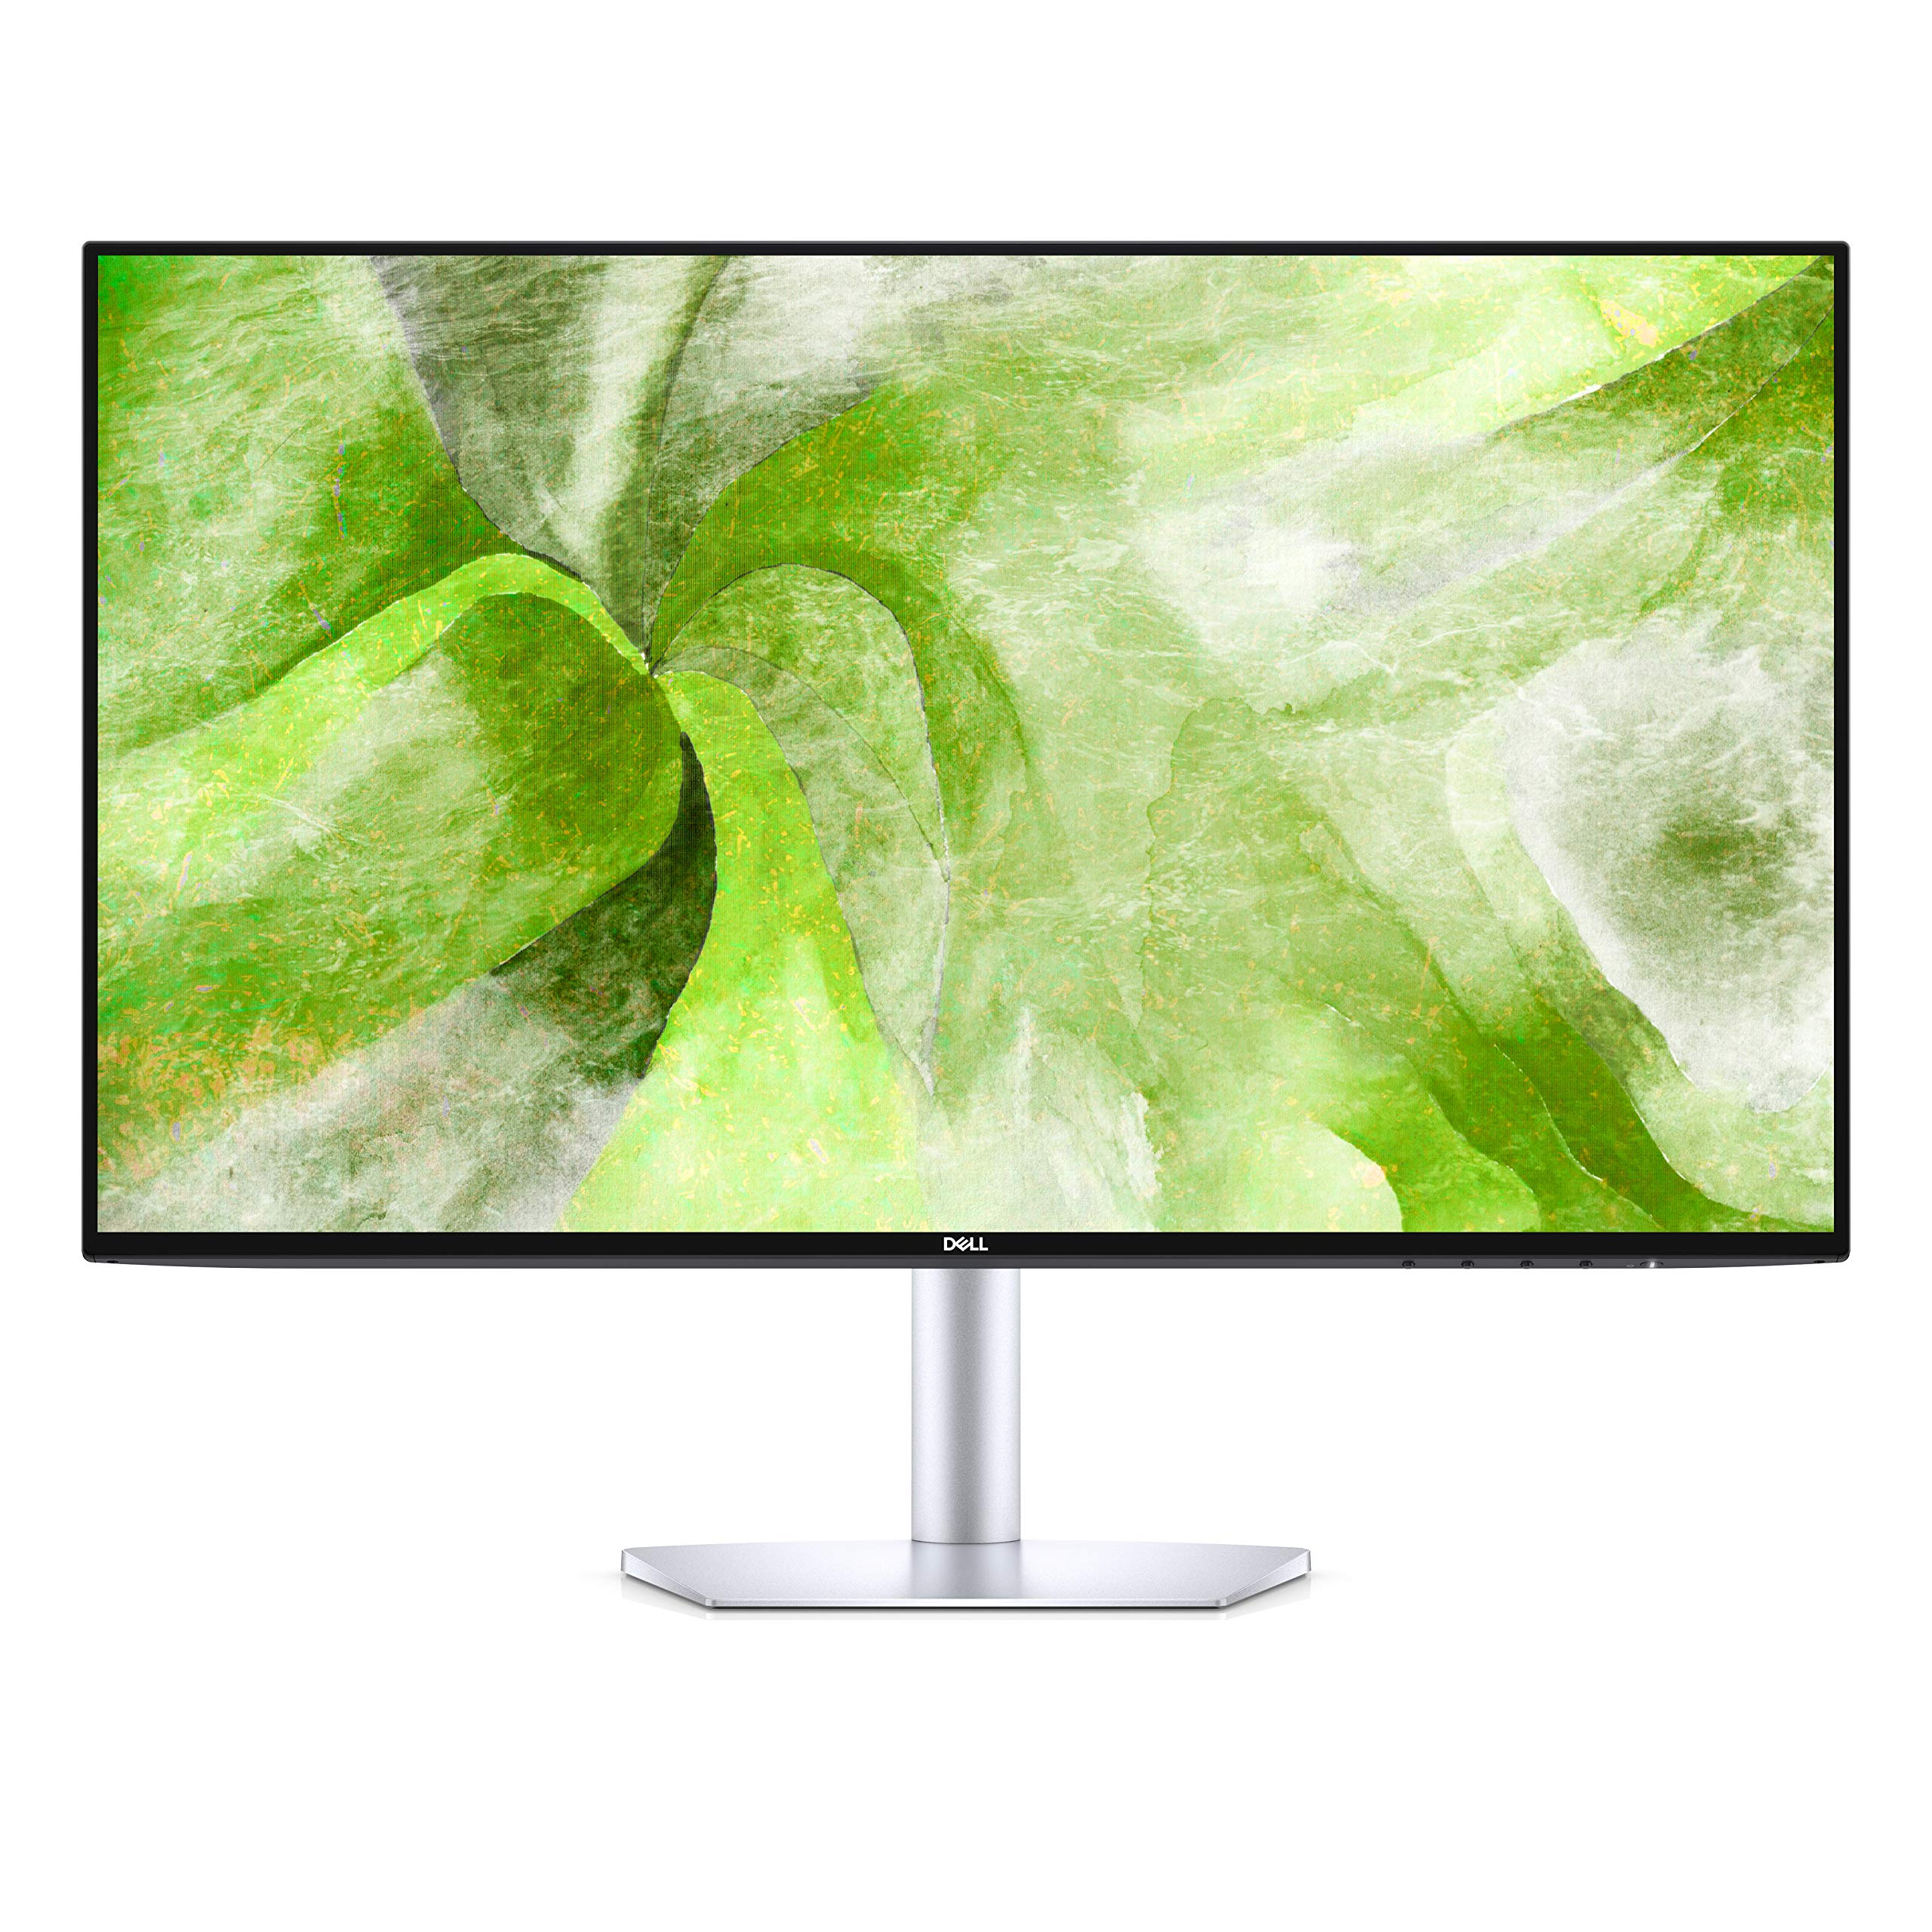 Dell S2419HM 24 Ultrathin Monitor